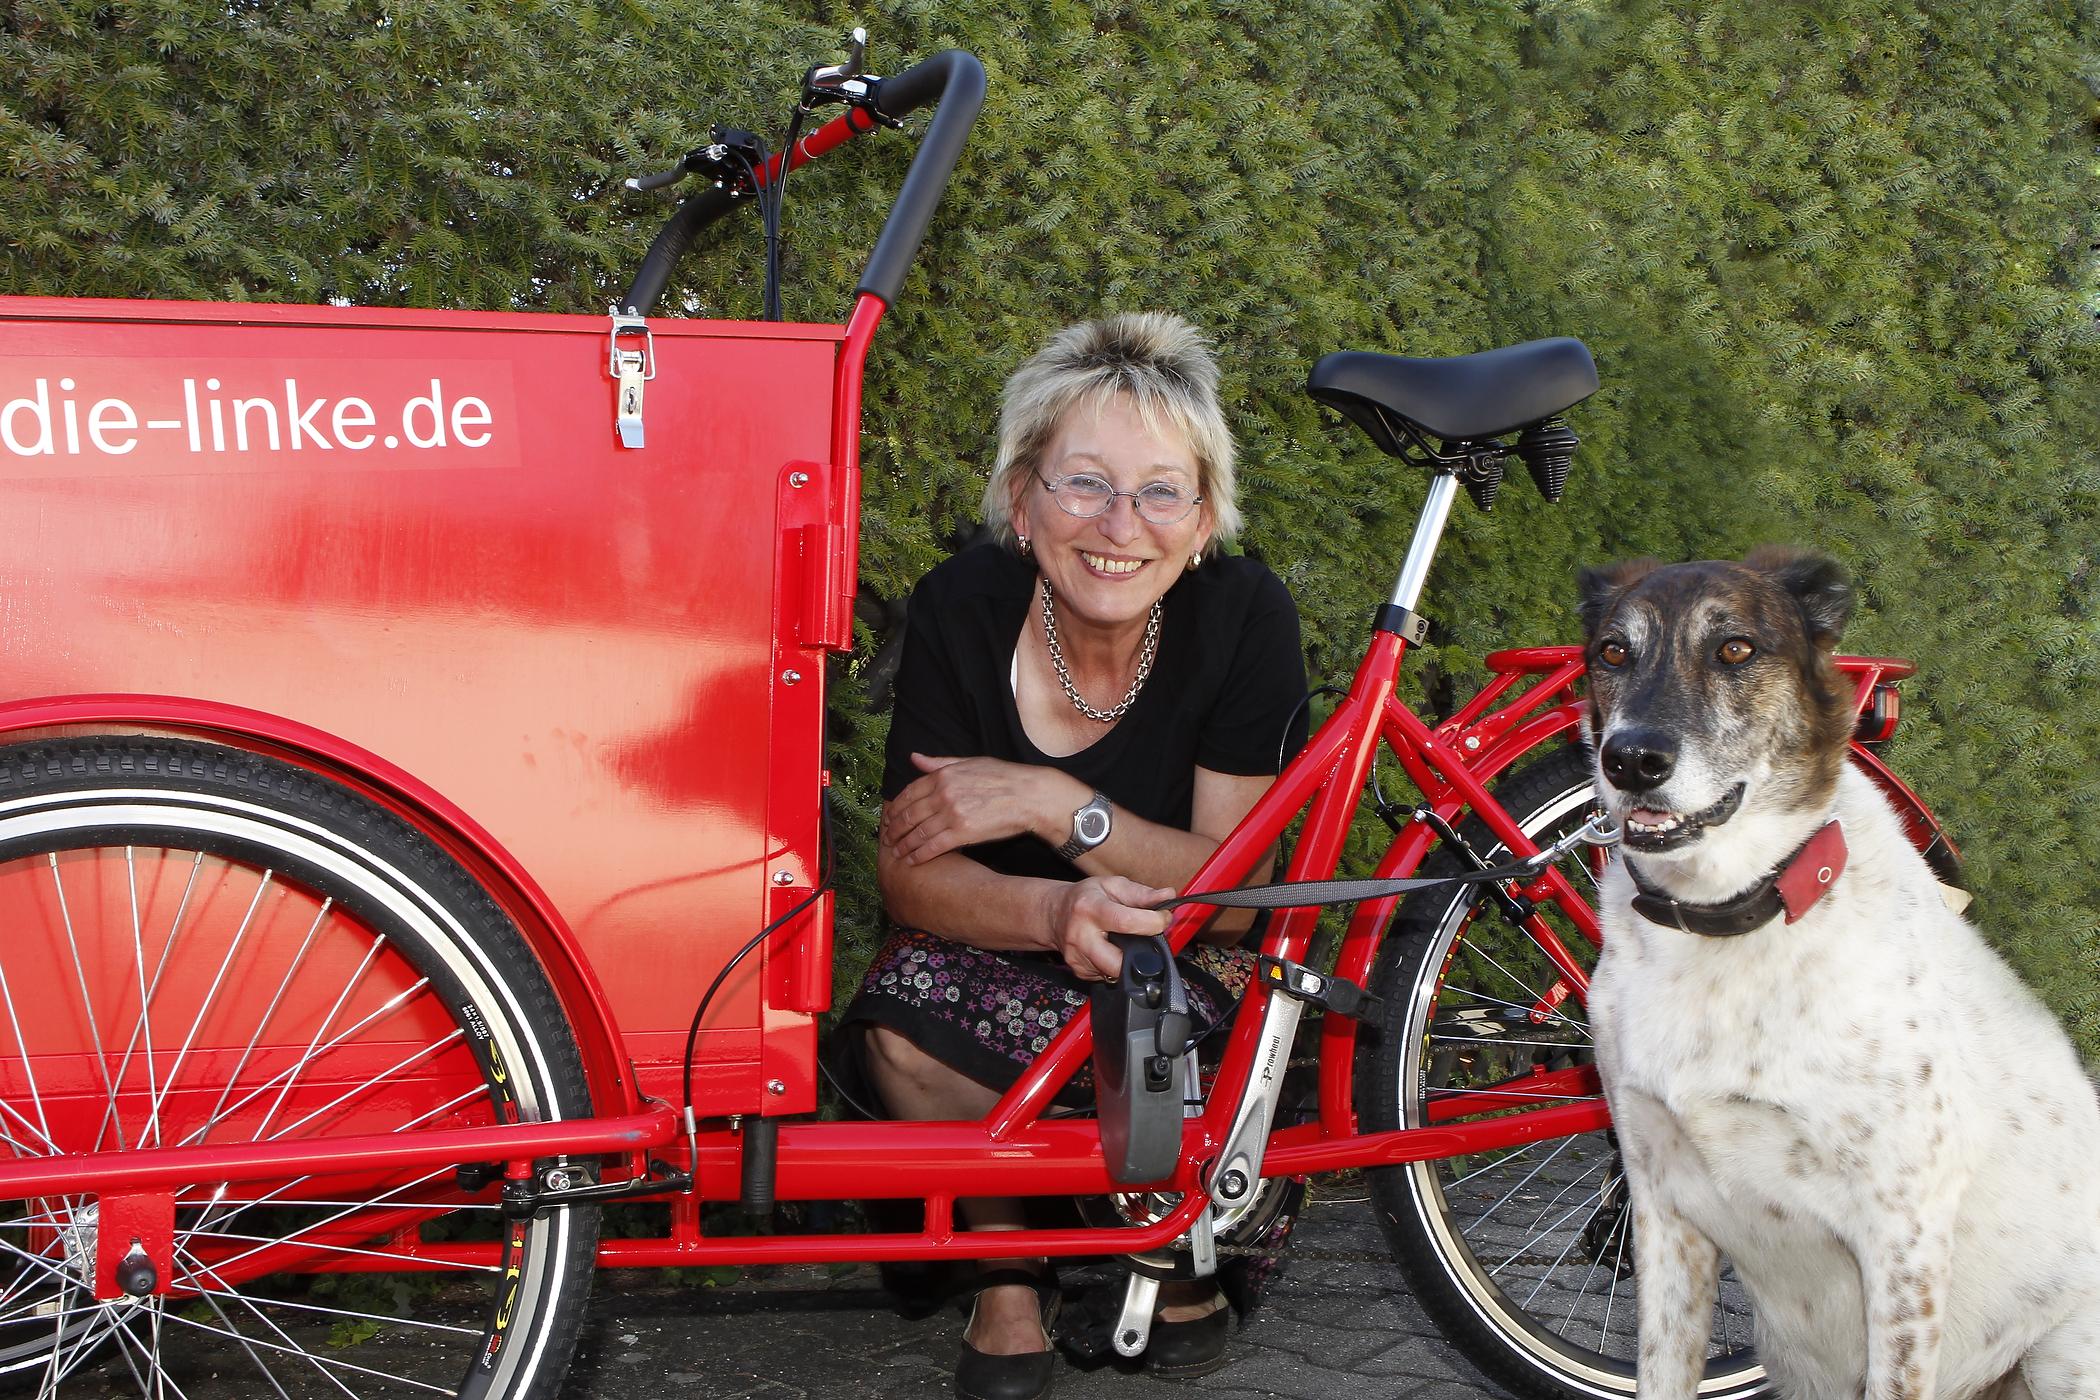 Eva Bulling-Schröter MdB Fraktion DIE LINKE mit ihrem Hund Chico